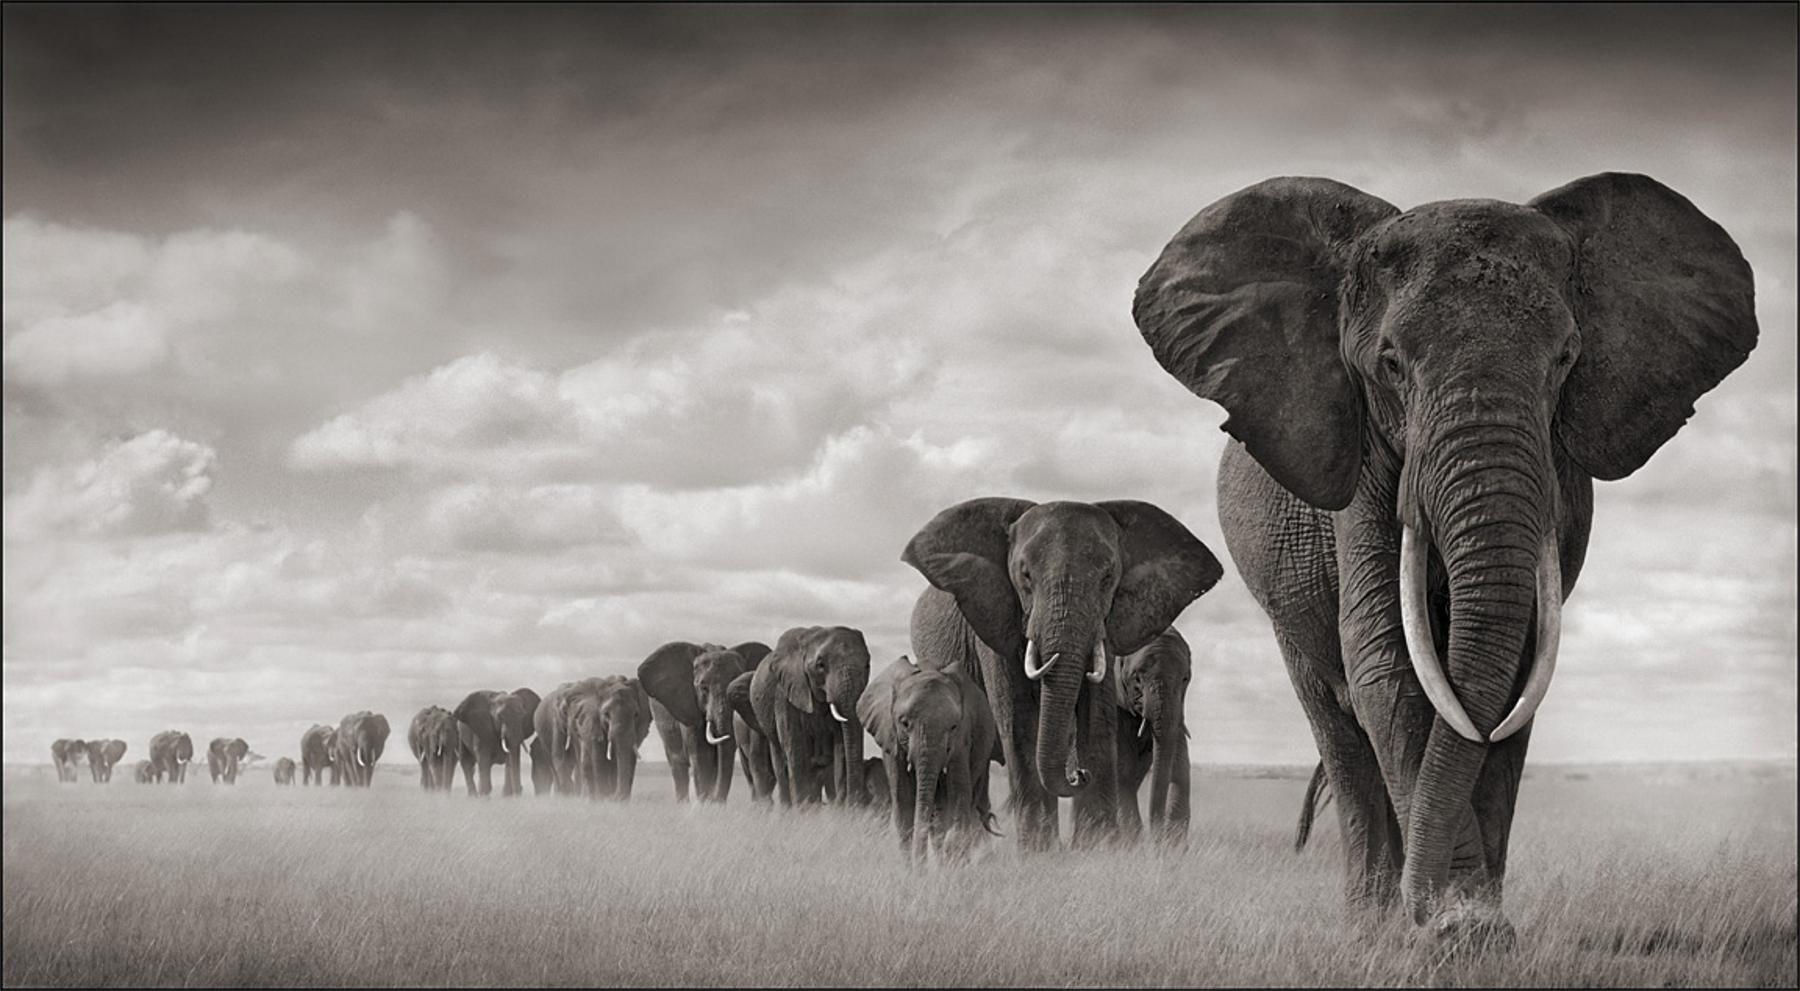 Elephants Walking Through Grass, Amboseli 2008.   Foto: Nick Brant. http://www.nickbrandt.com/portfolio.cfm?nK=8877=0=1